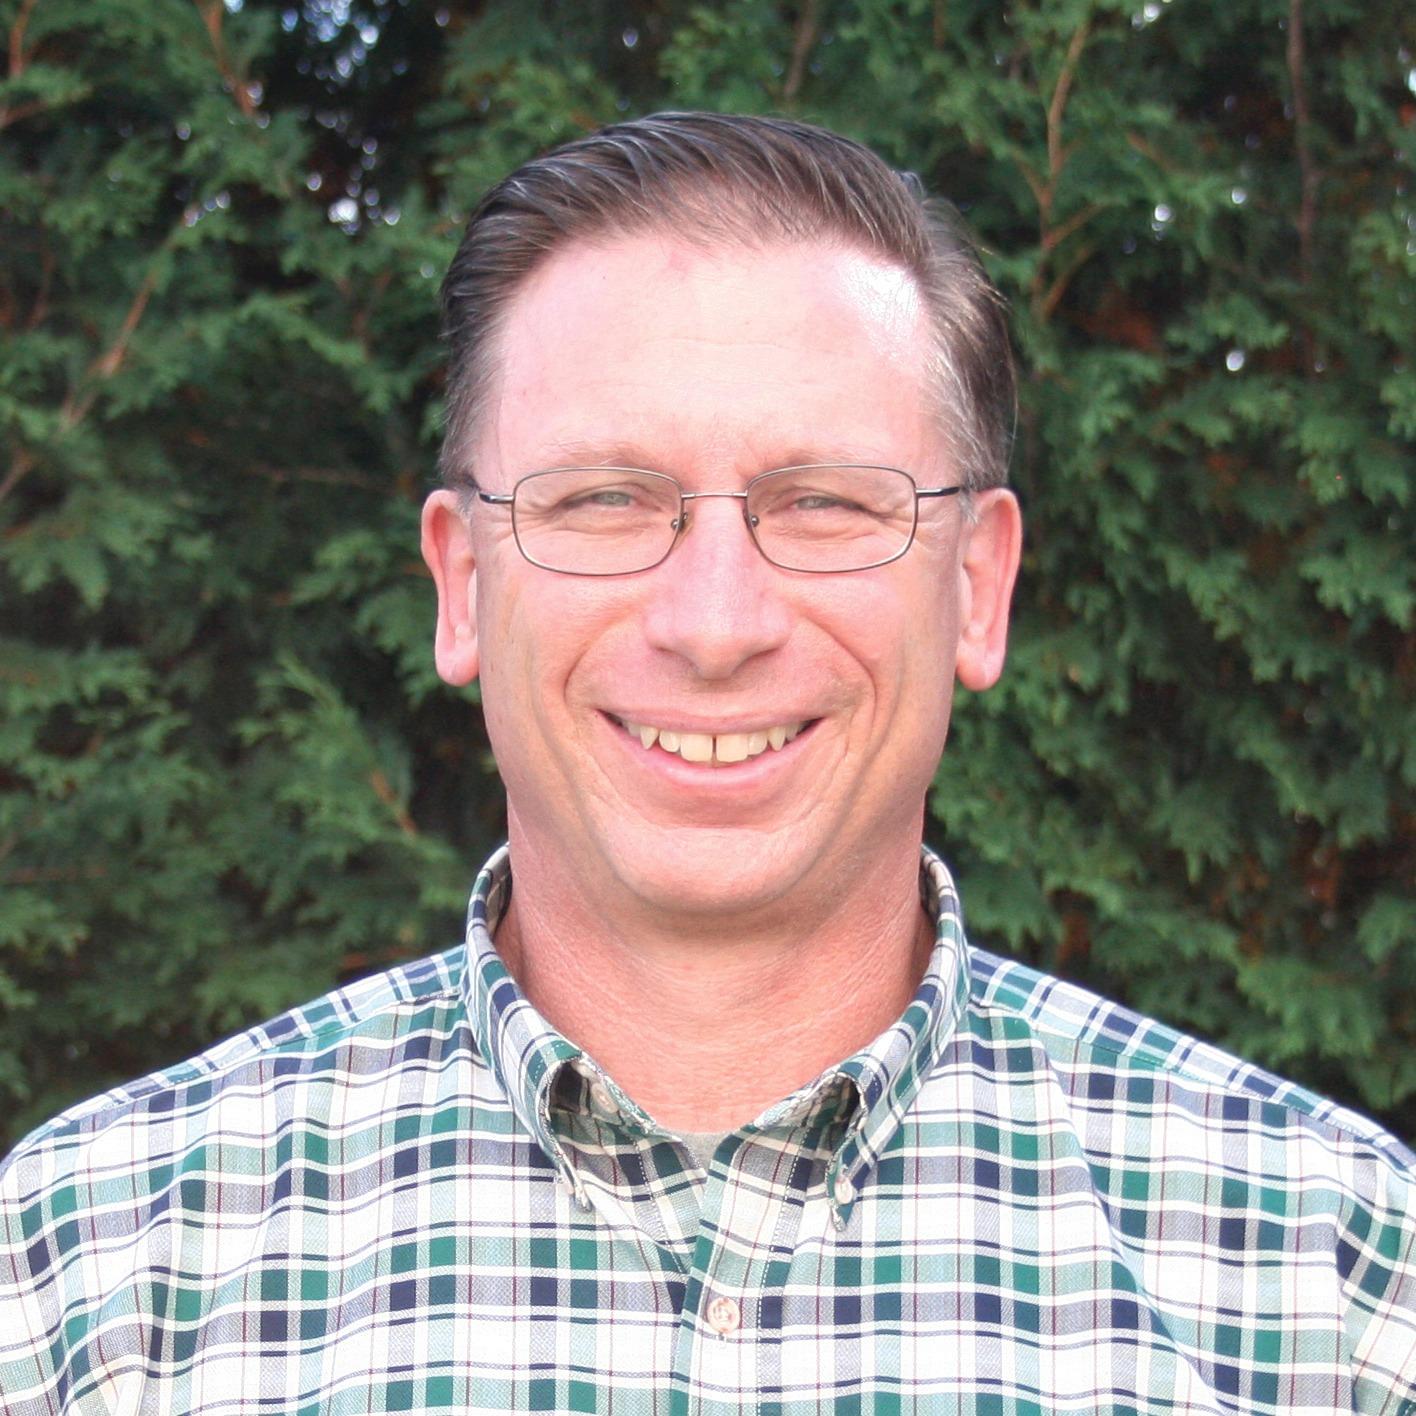 John Mesko